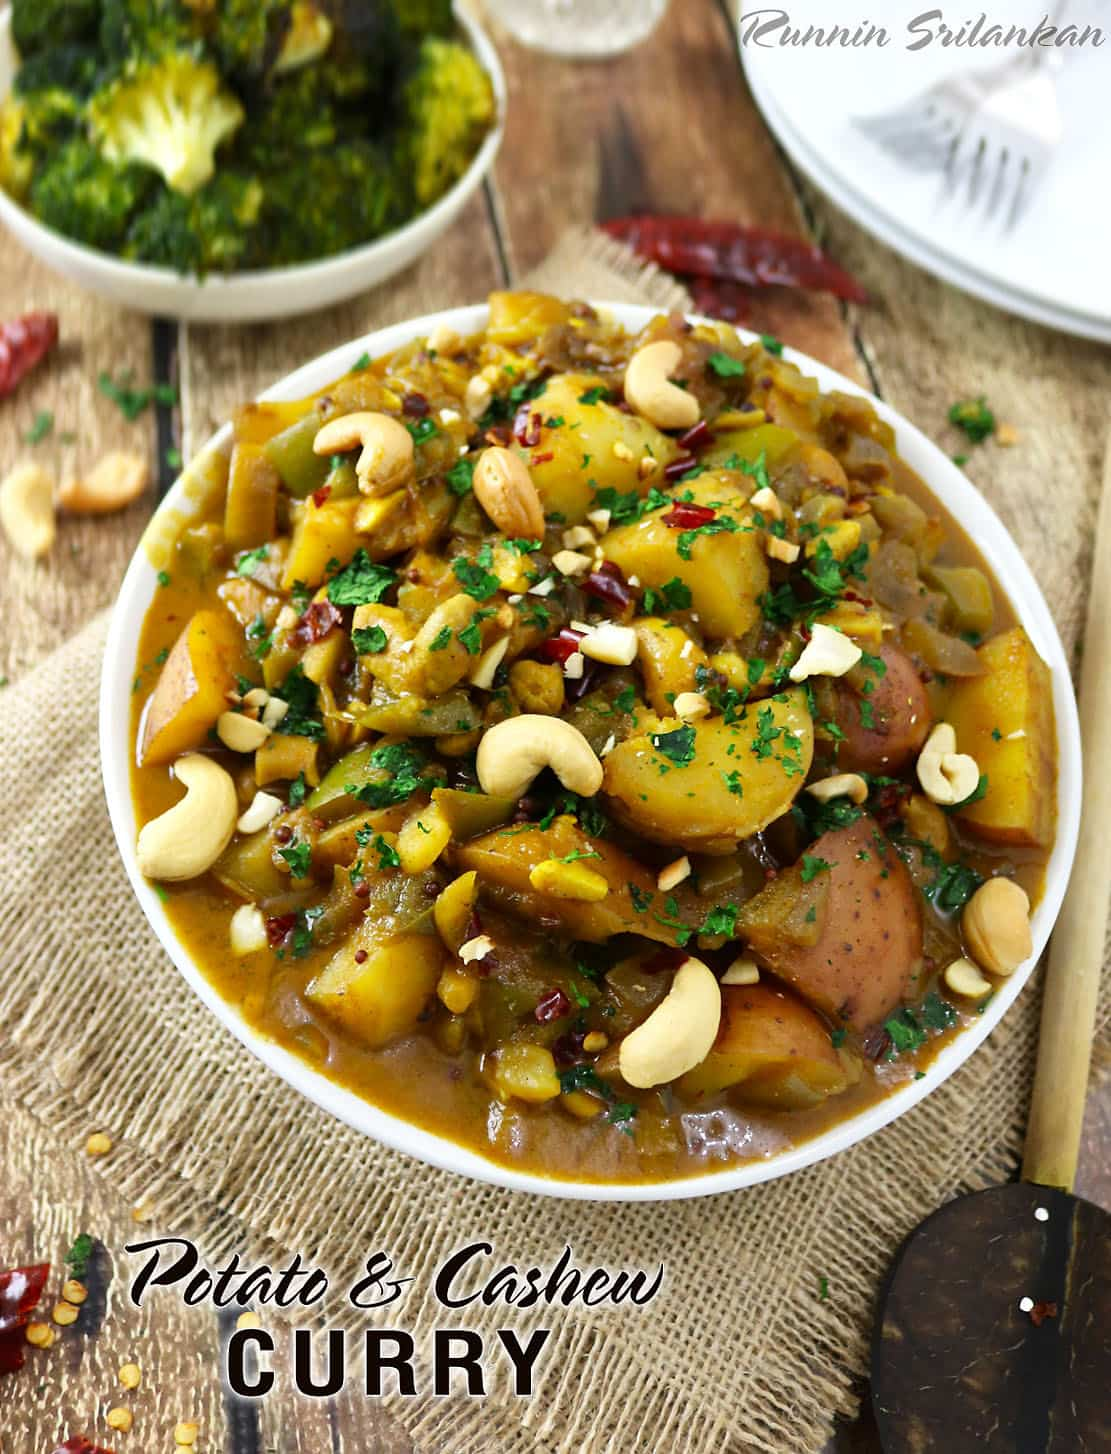 Sri Lankan Potato & Cashew Curry